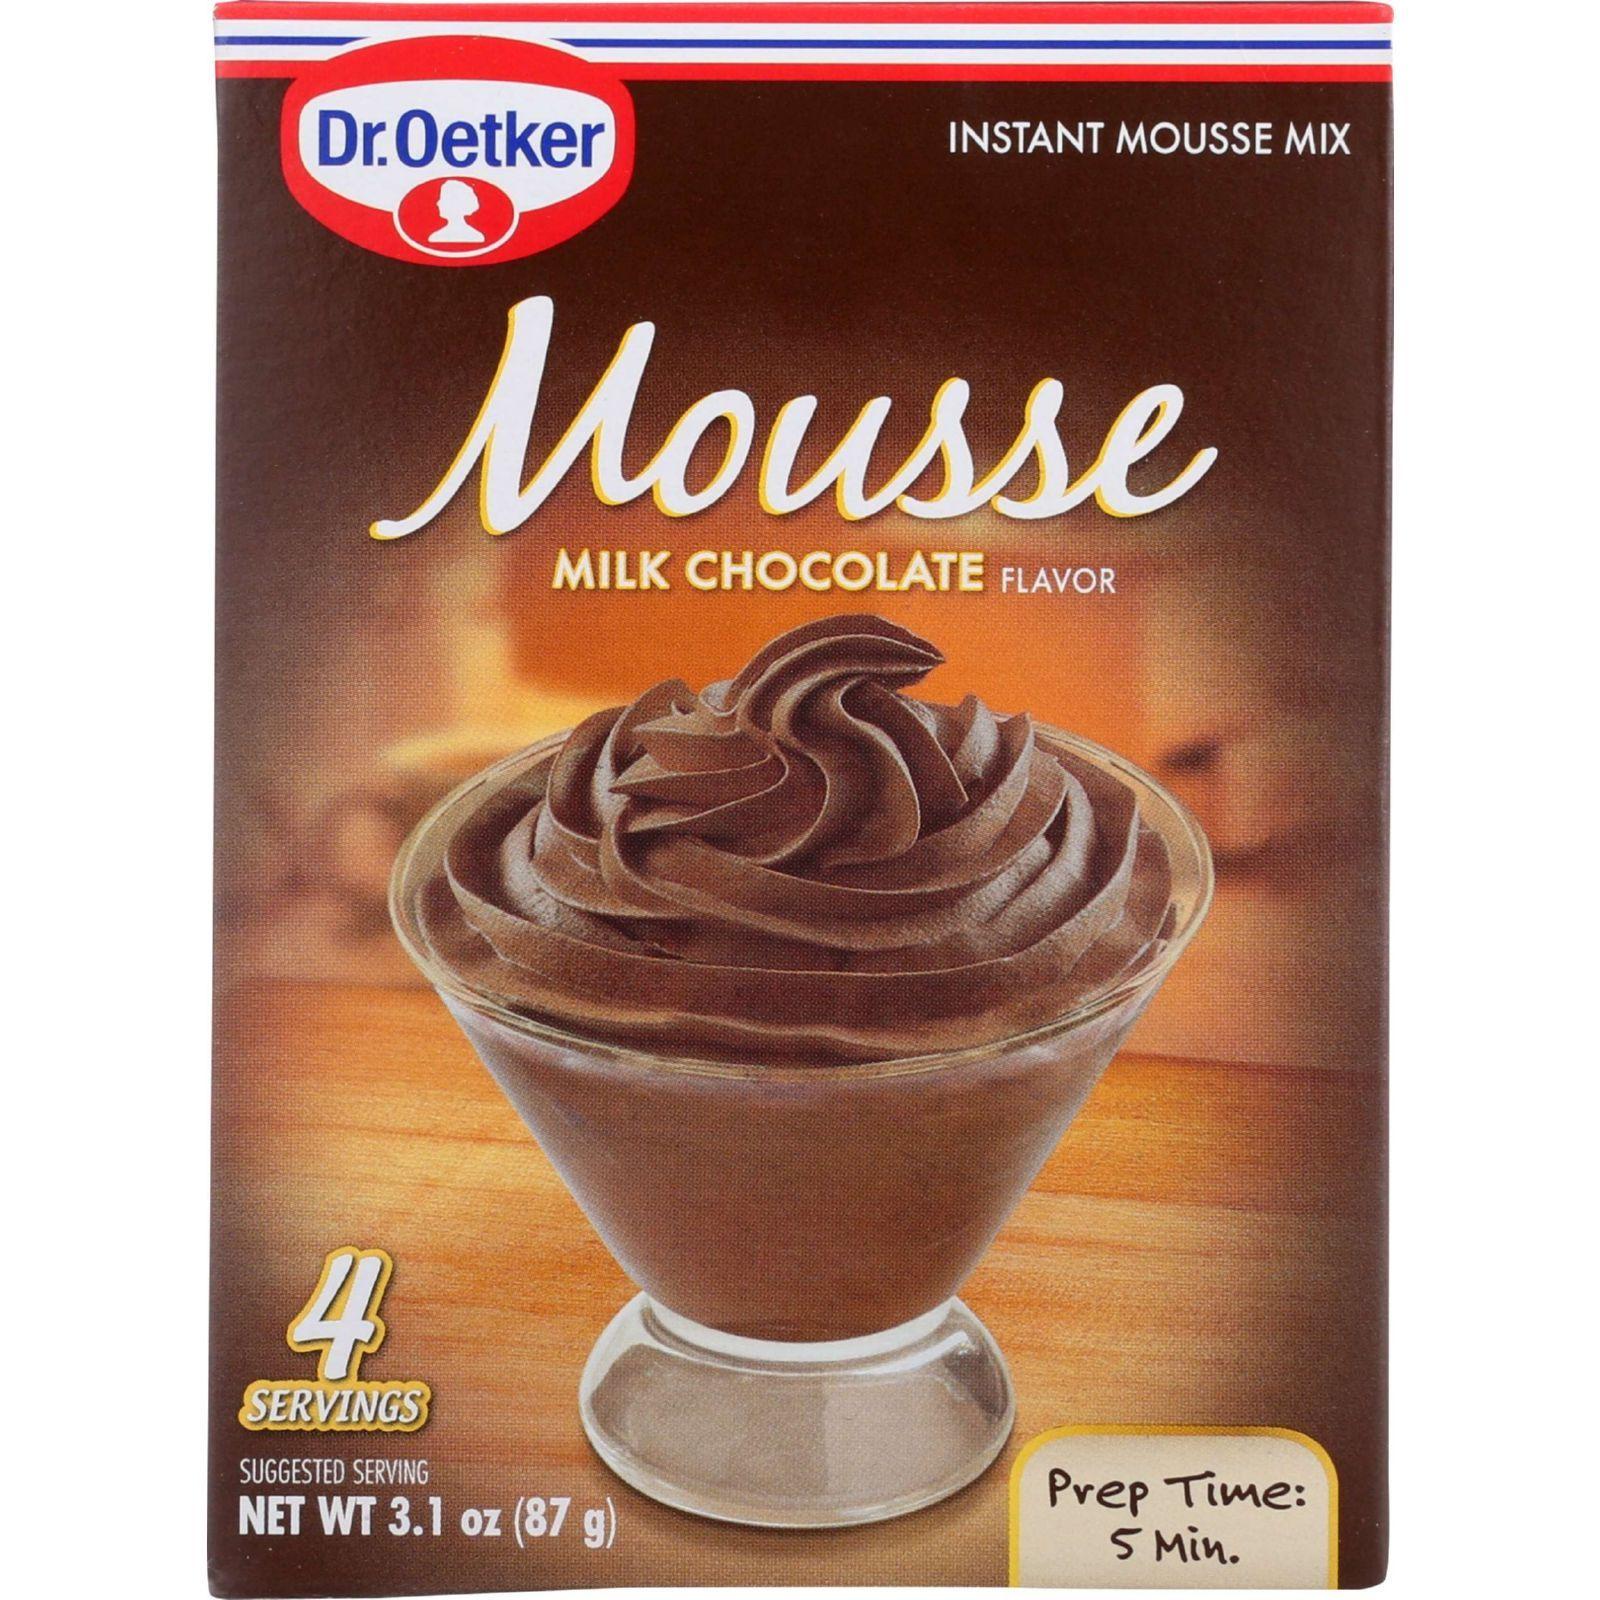 Dr. Oetker Organics Mousse Mix - Supreme - Instant - Milk Chocolate - 3.1 oz - 1 each